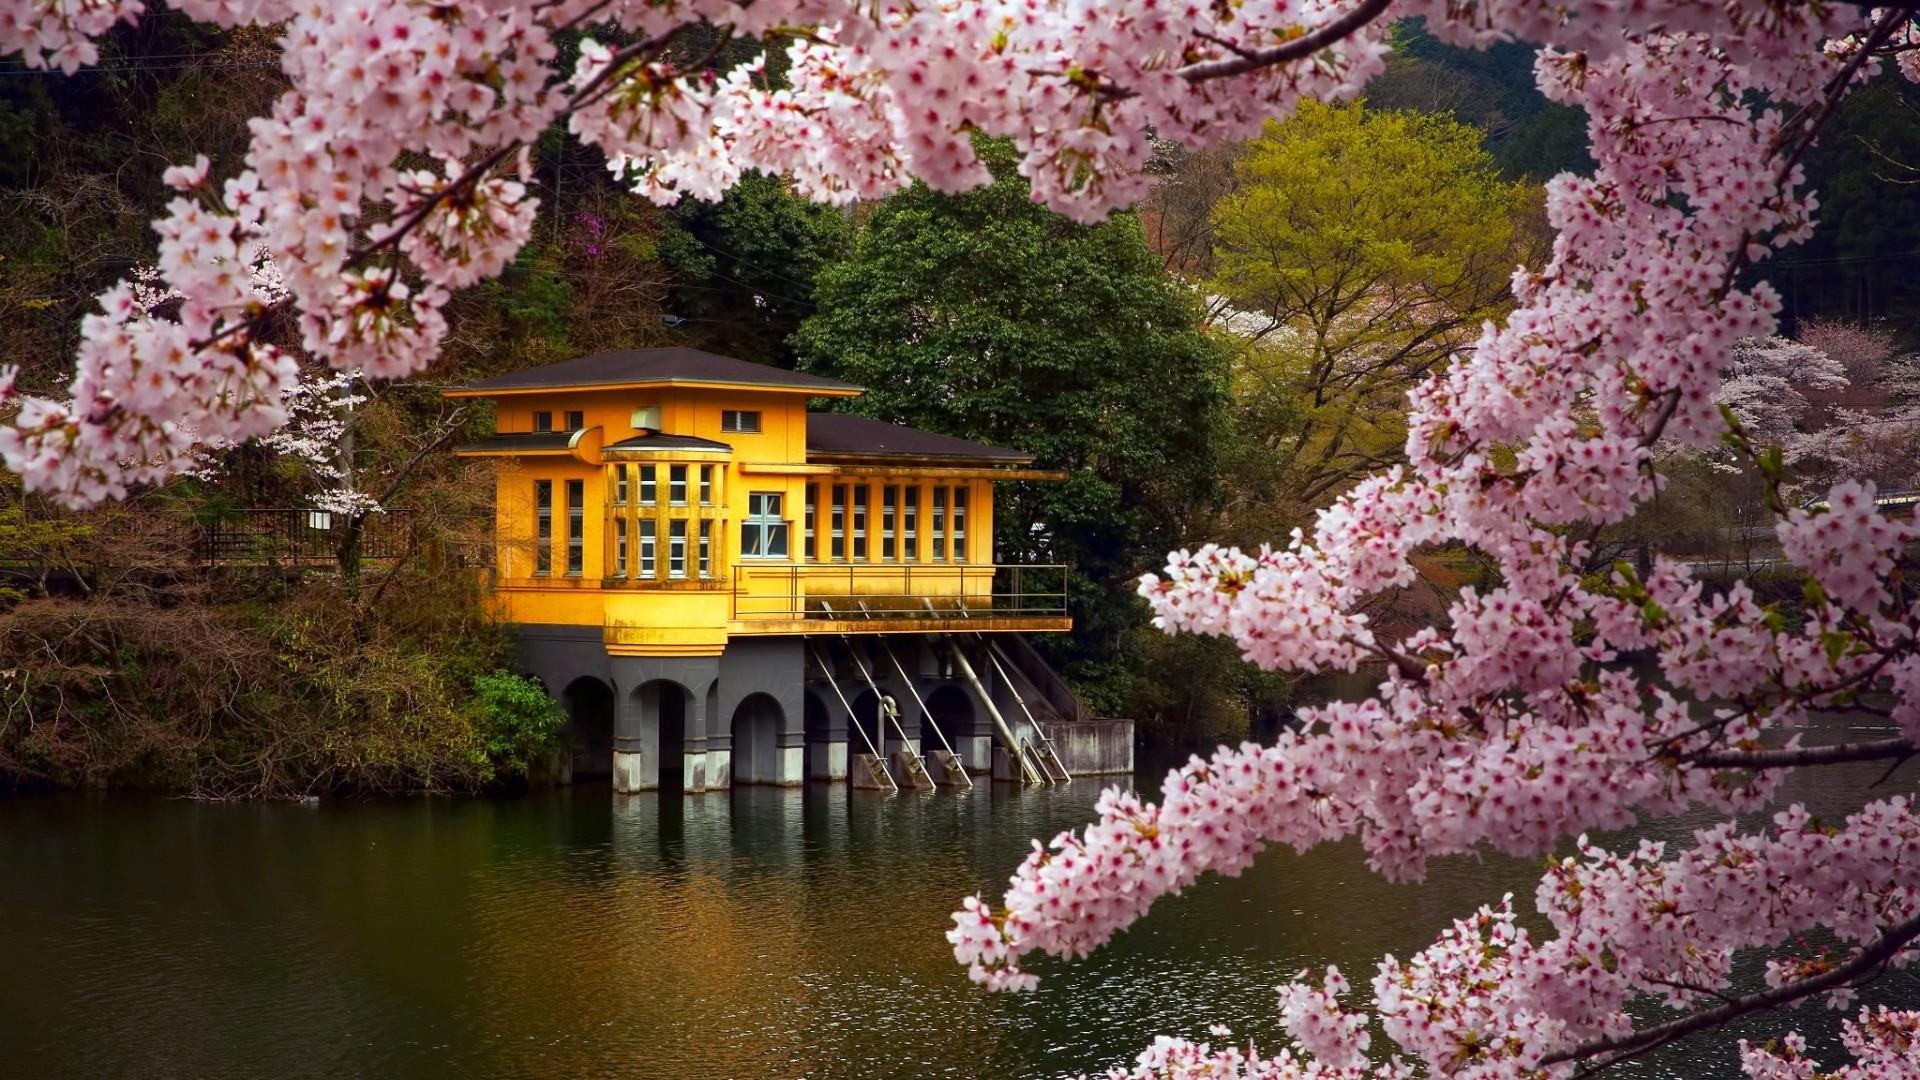 Japanese Street In Springtime Hd Wallpaper Background Image